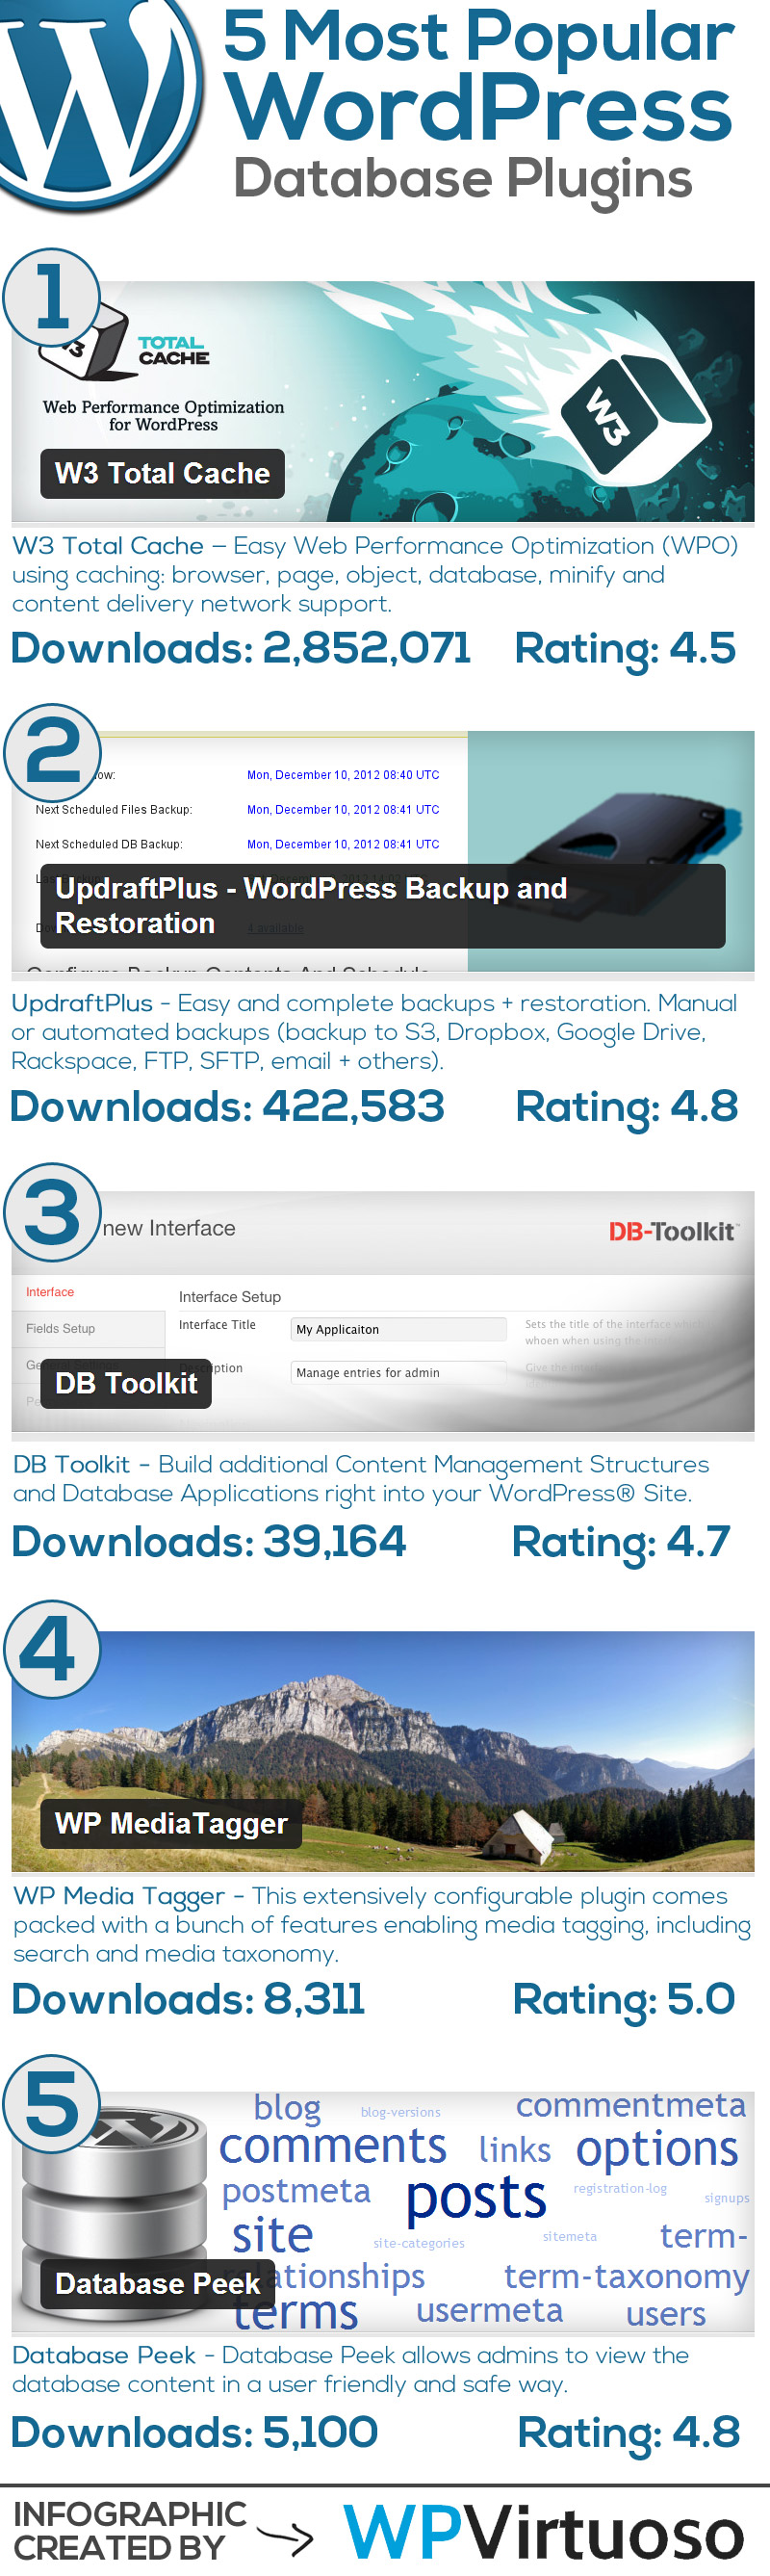 Best-Wordpress-Database-Plugins-Infographic